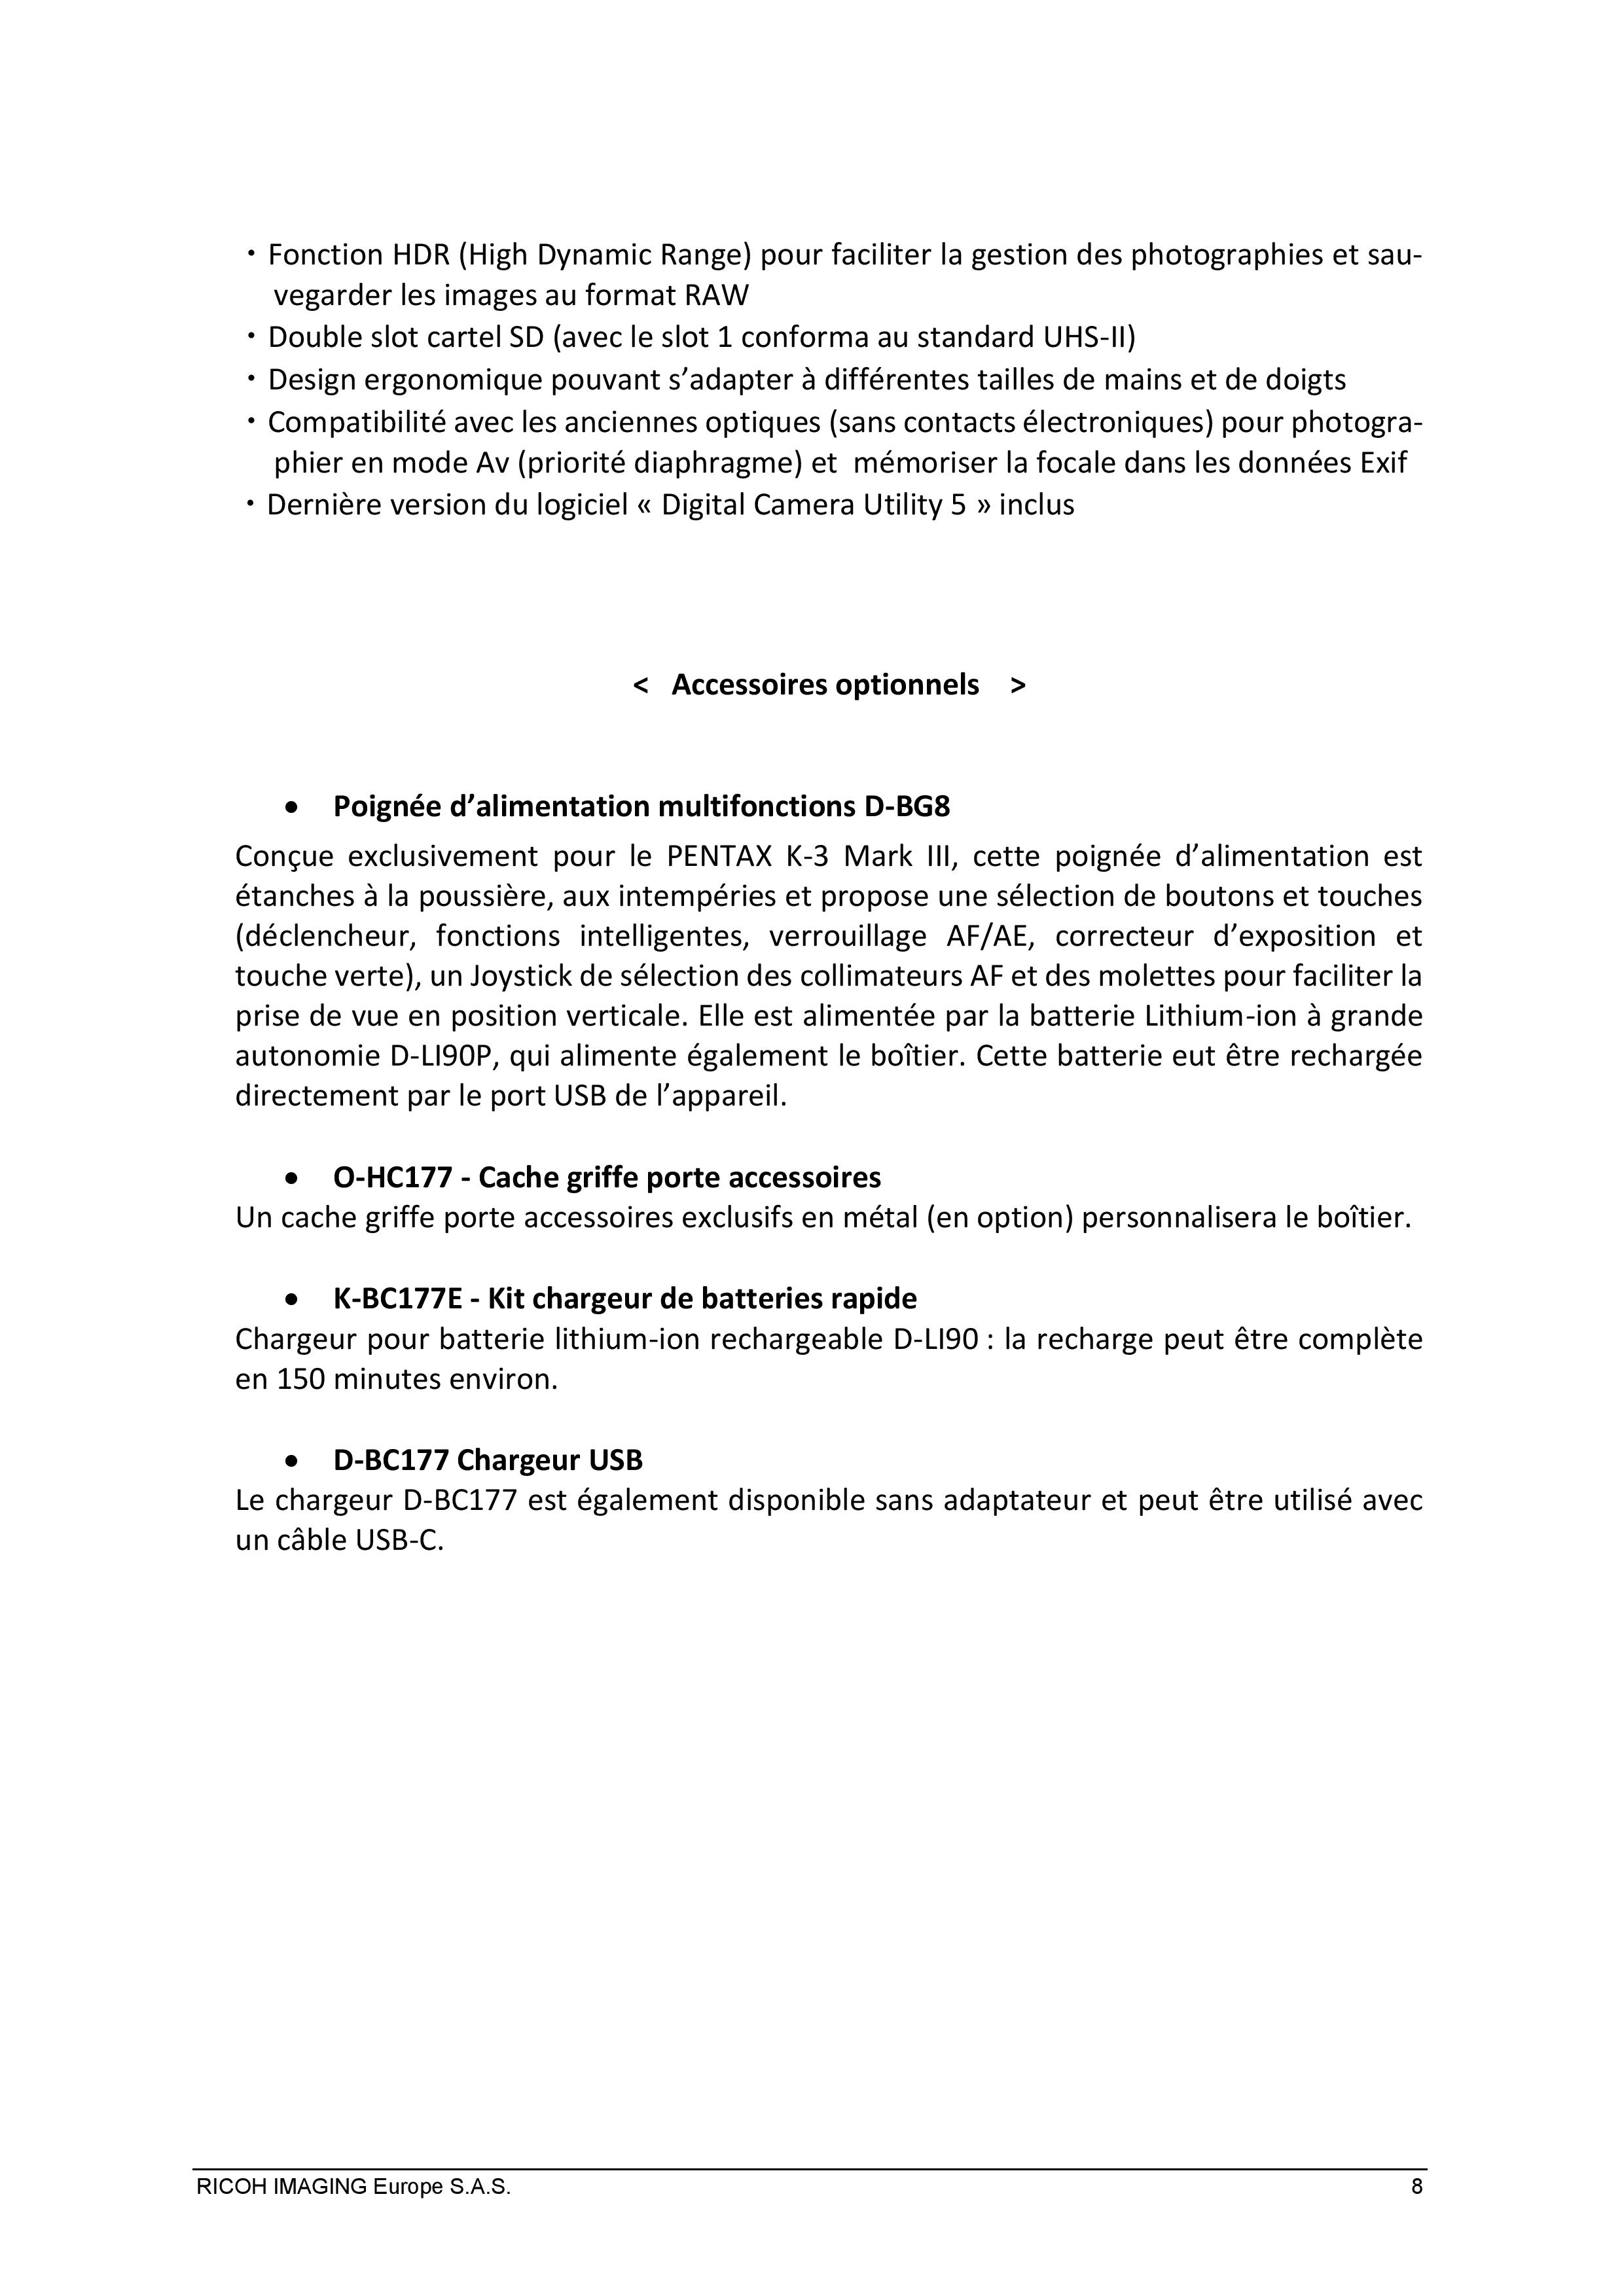 PENTAX RICOH IMAGING - Communiqué de presse du K3 Mark III 21033103154823142217344194